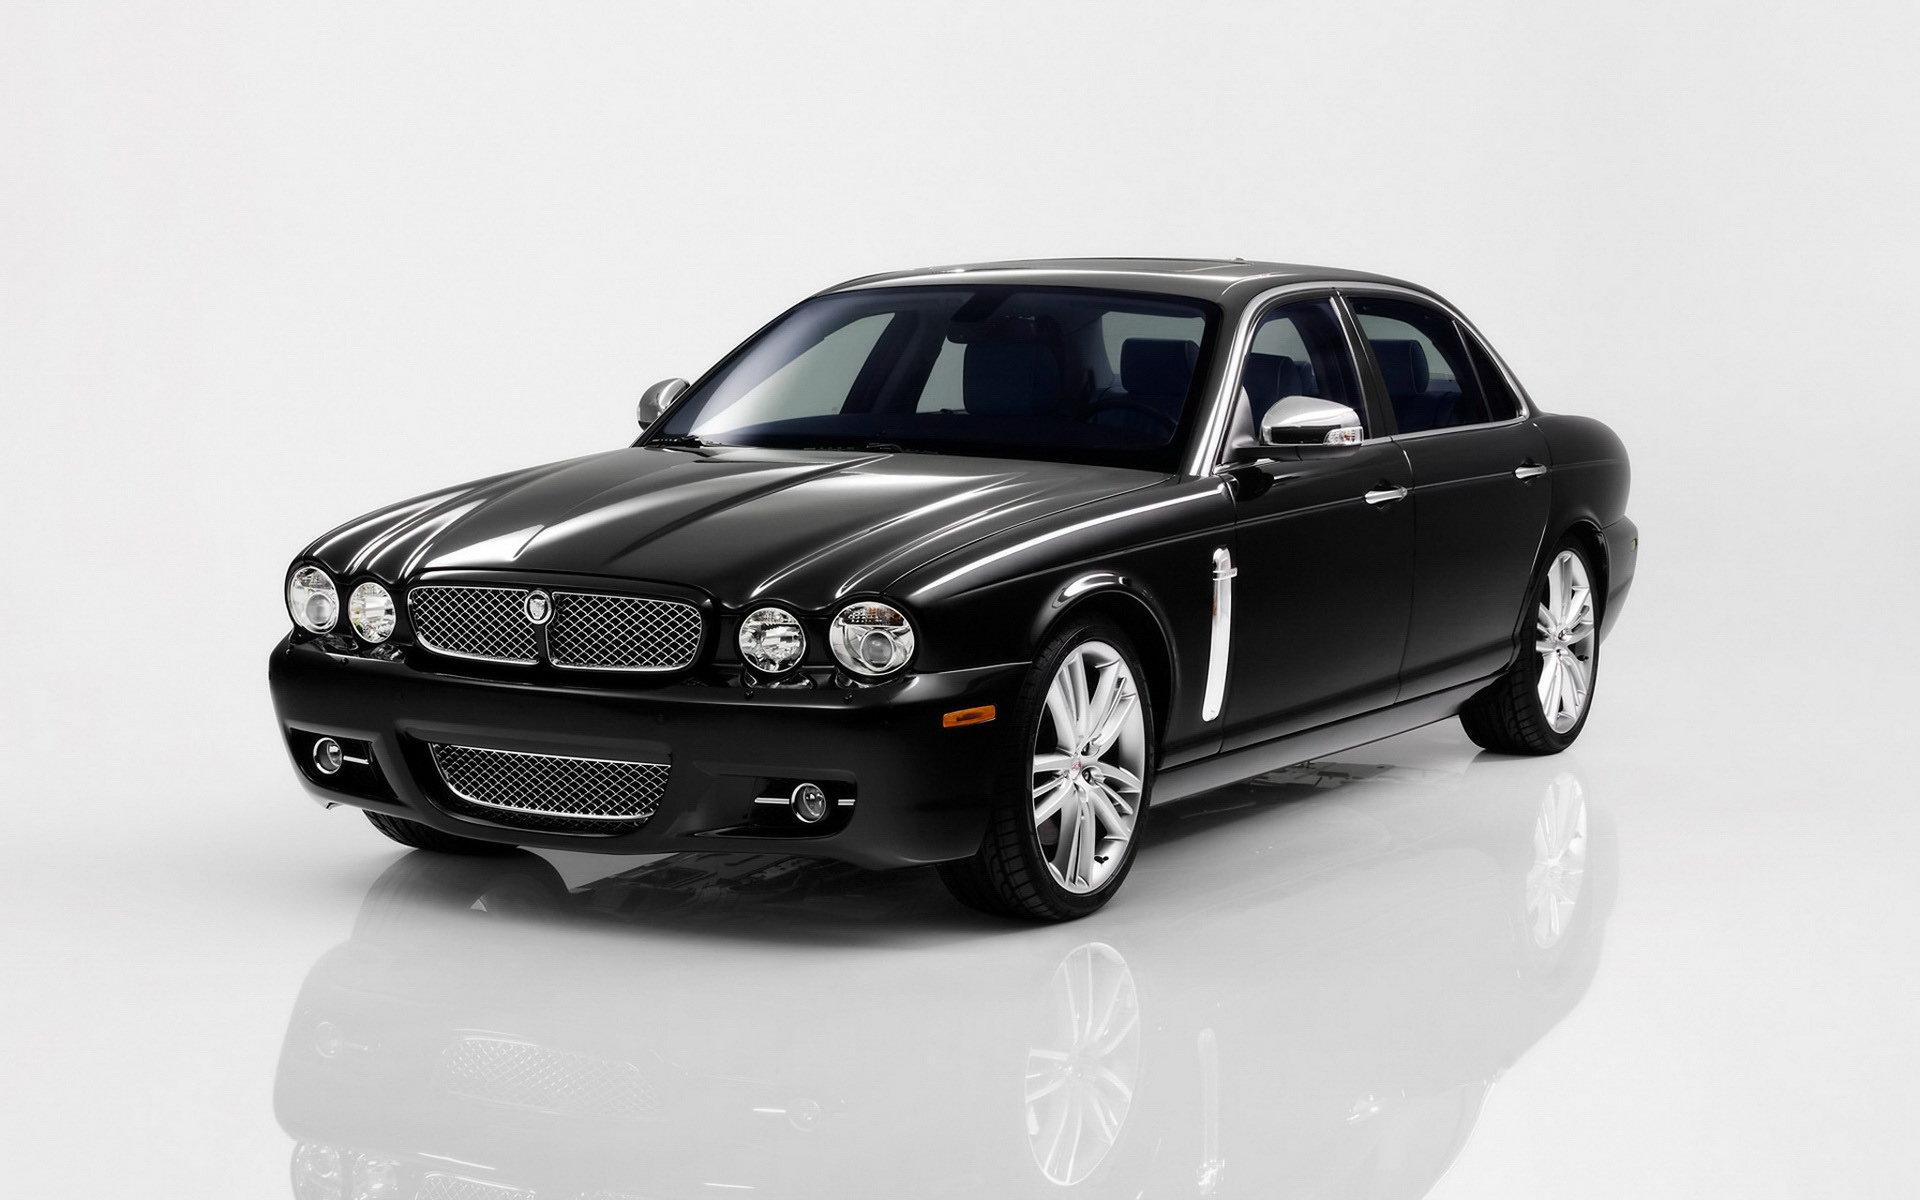 Free Jaguar Car High Quality Wallpaper Id 398127 For Hd 1920x1200